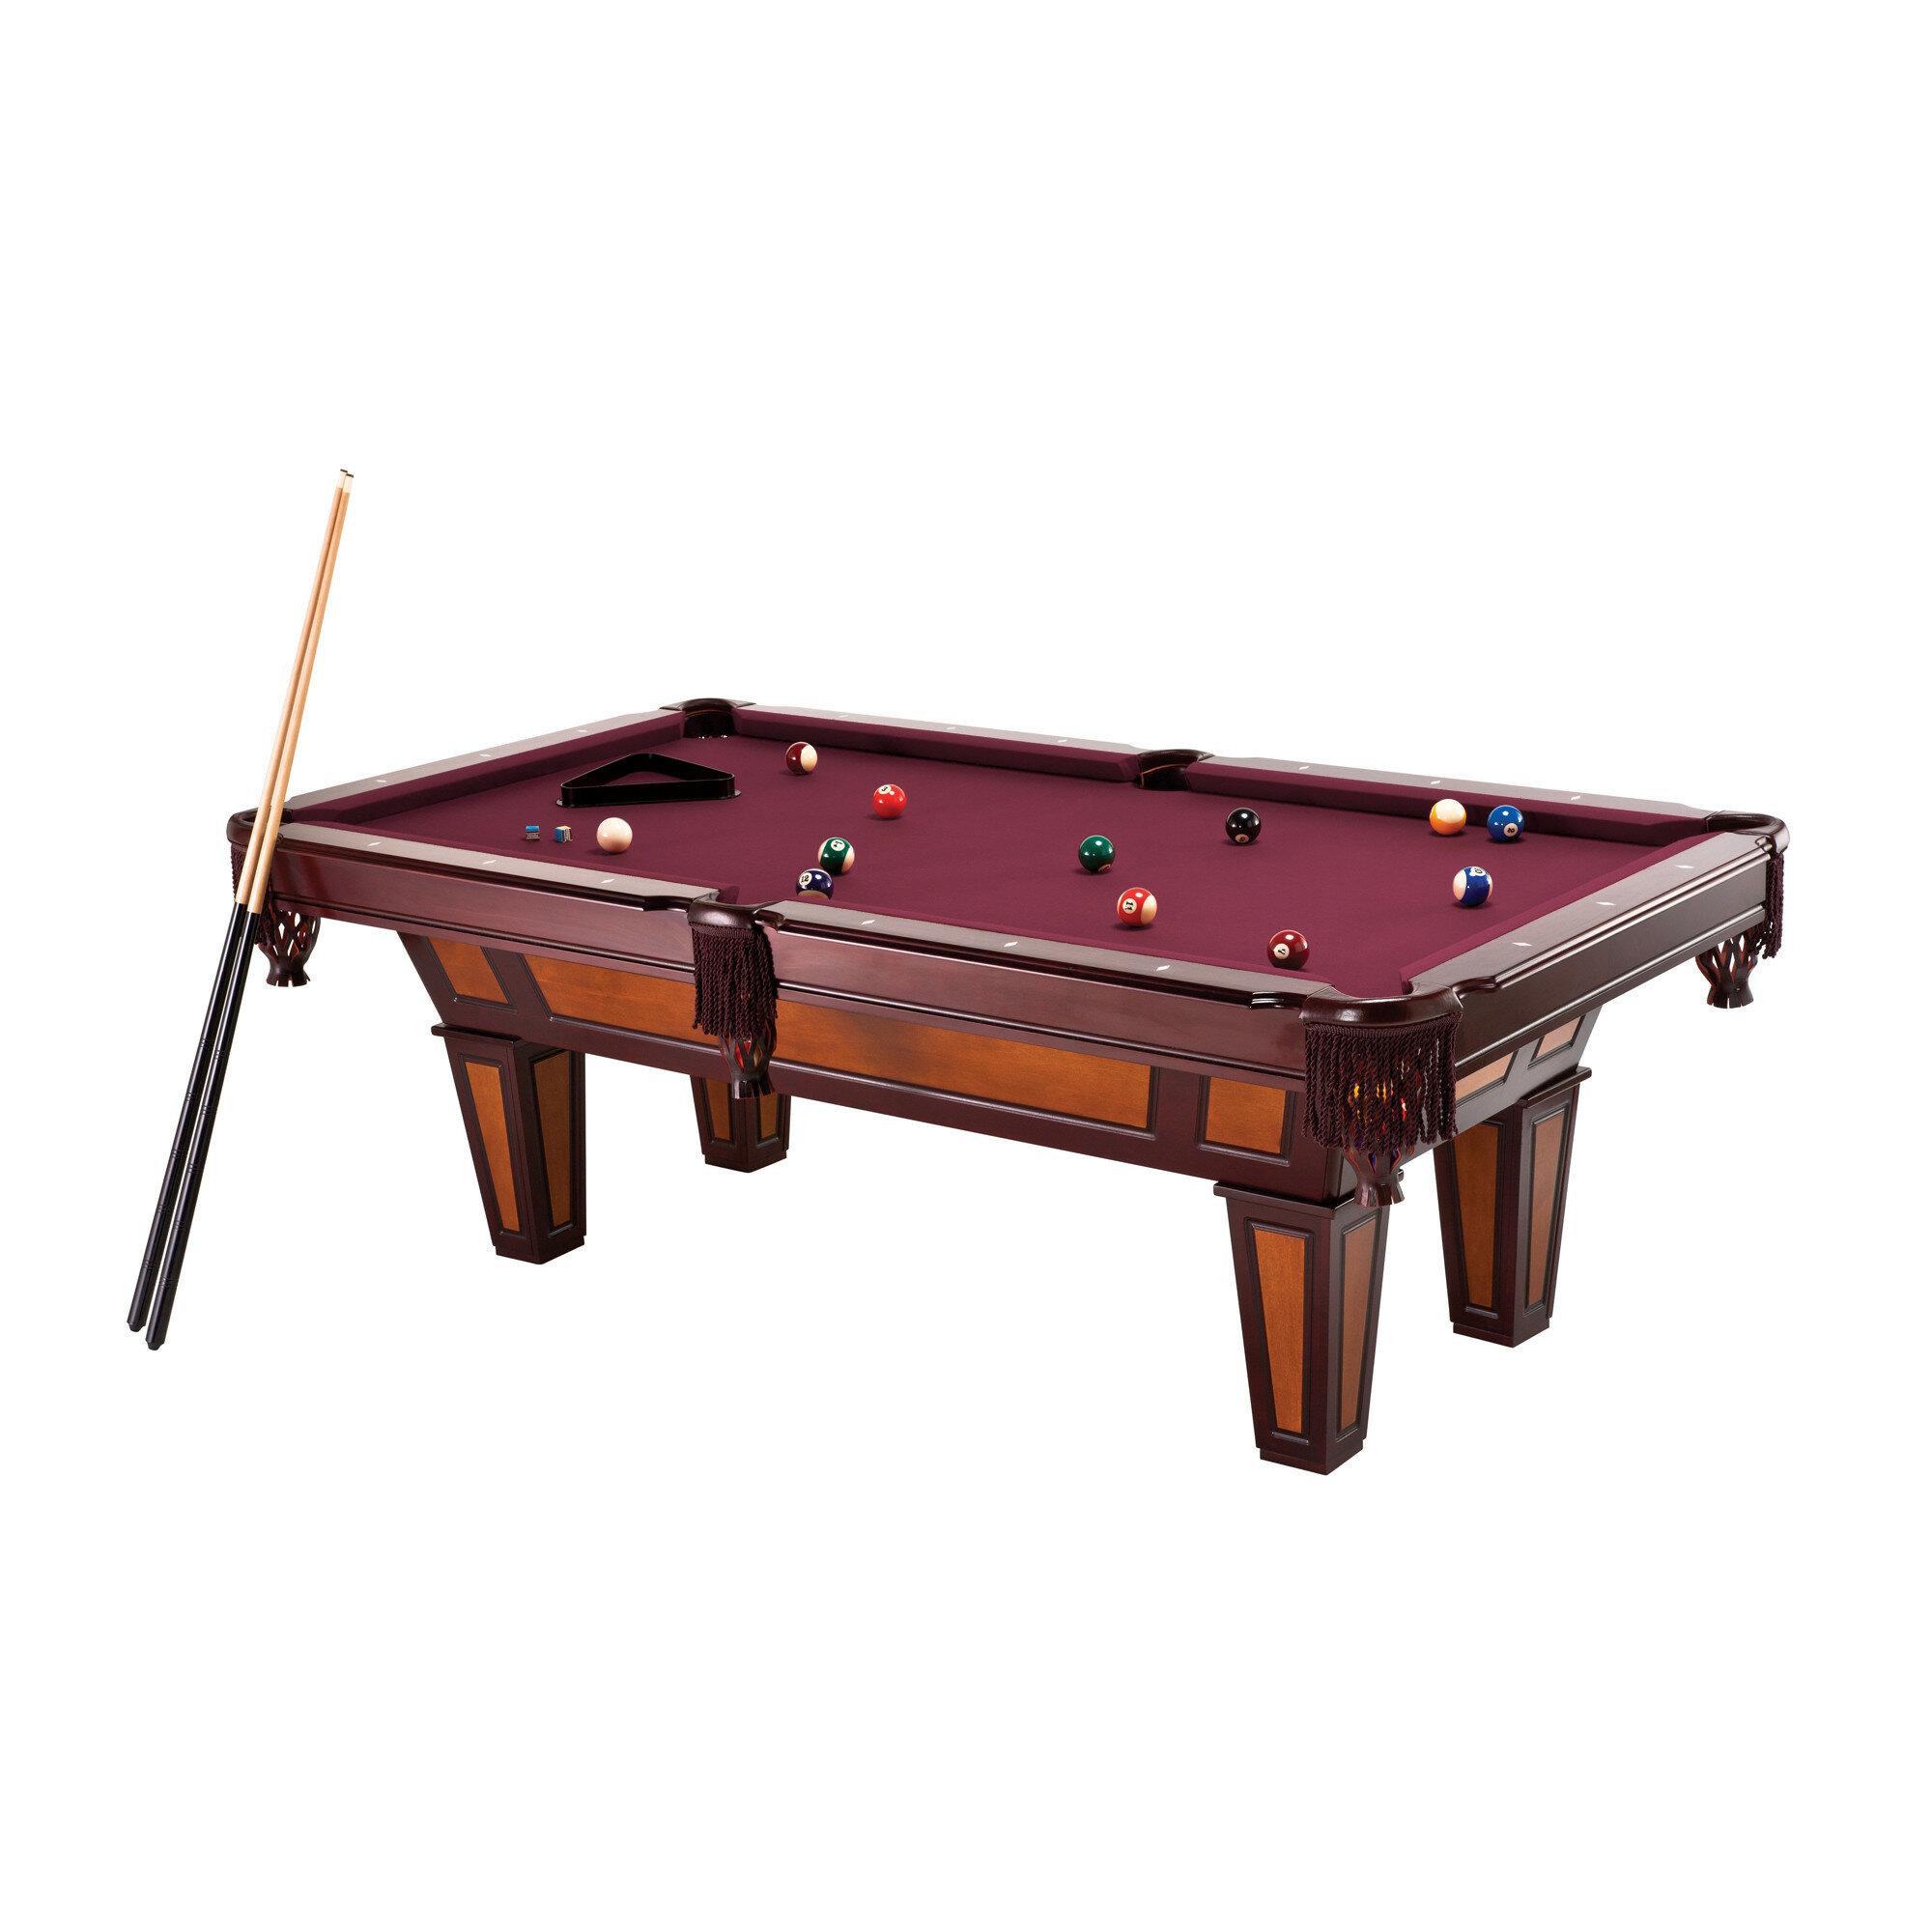 359c40ca7b92 Fat Cat Reno Billiards Table with Accessories